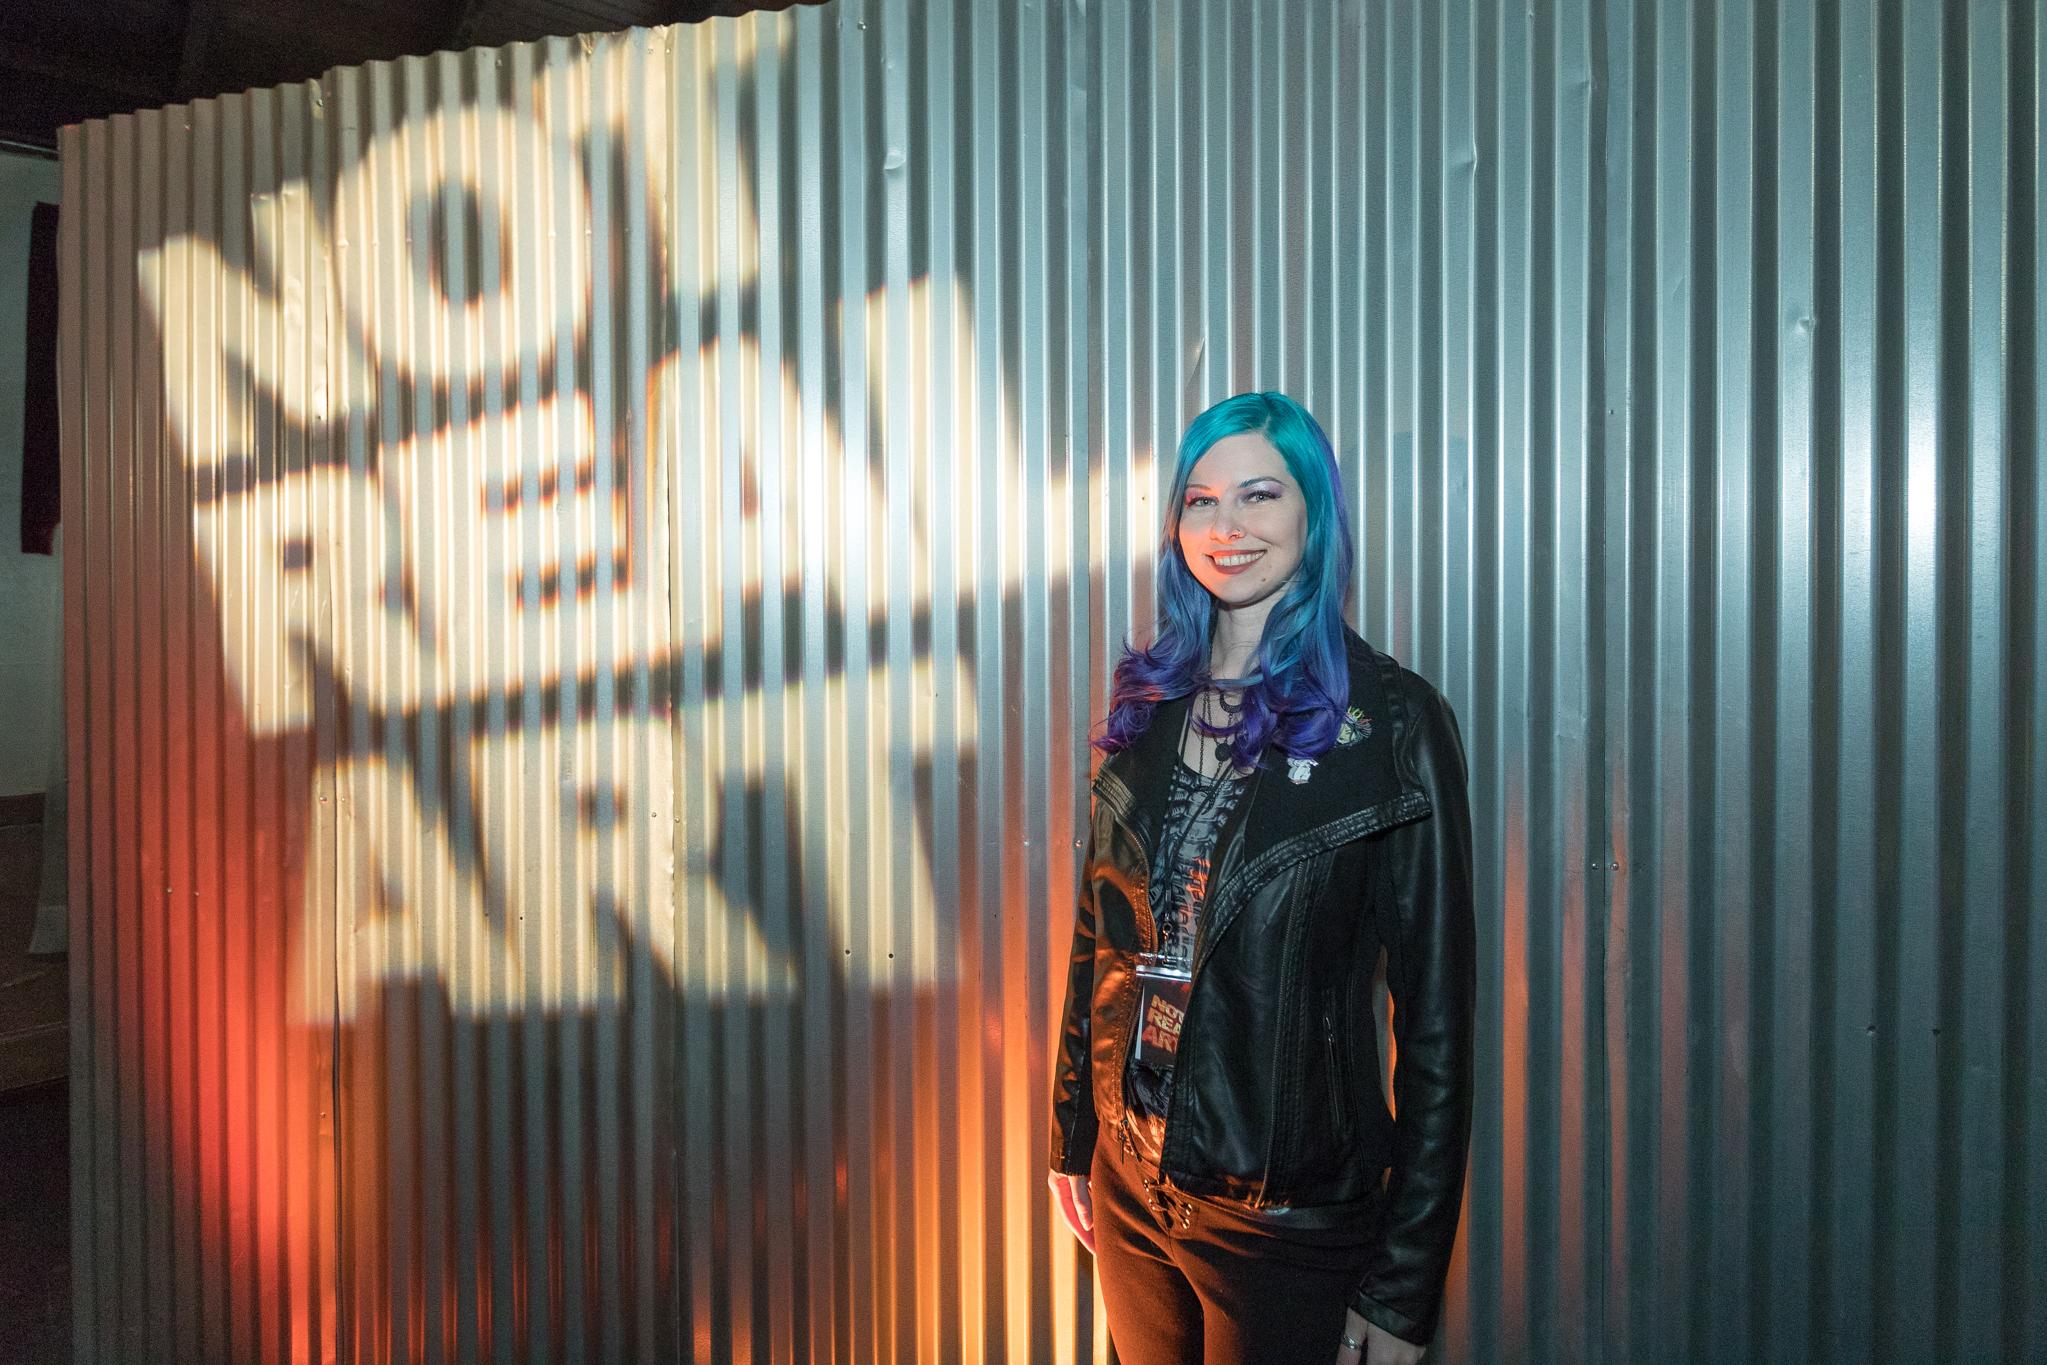 Panelist Leah Titus, Digital Marketing Expert